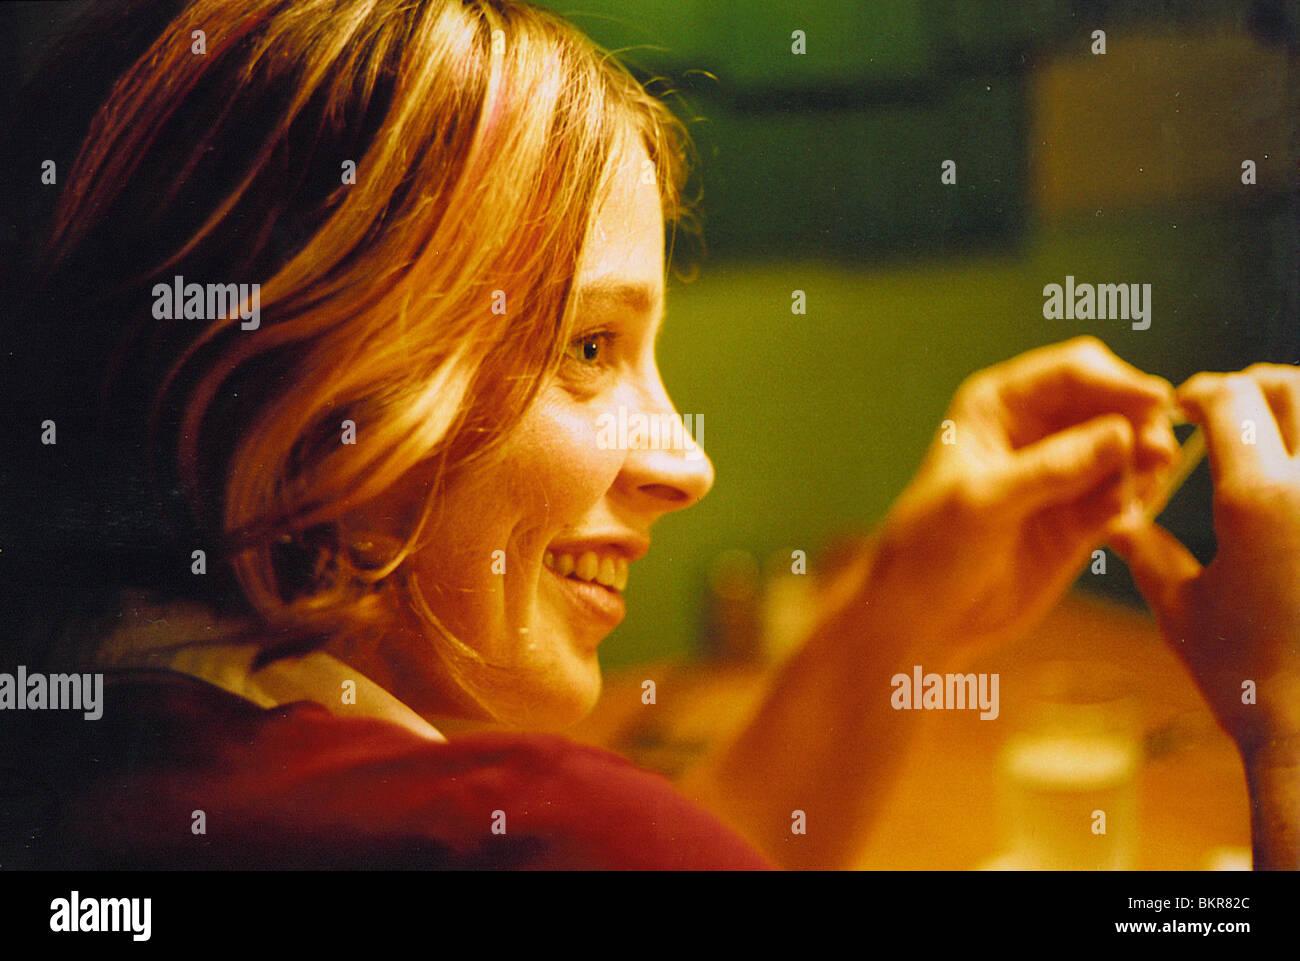 BEESWAX (2009) TILLY HATCHER ANDREW BUJALSKI (DIR) 002 - Stock Image